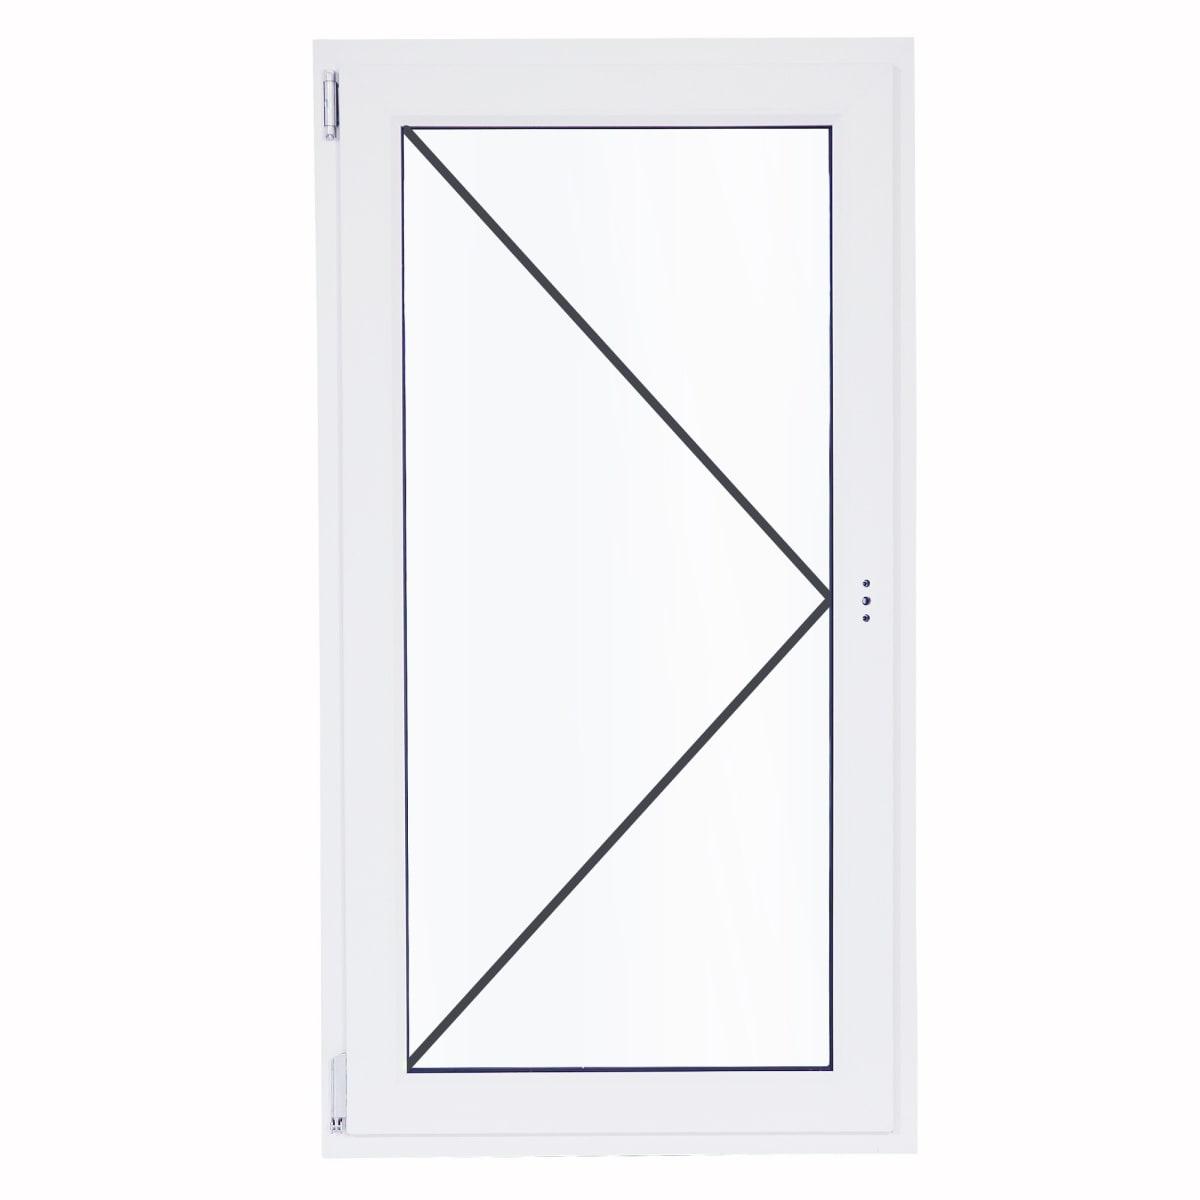 Окно ПВХ одностворчатое 90(87)х60 см поворотно-откидное левое